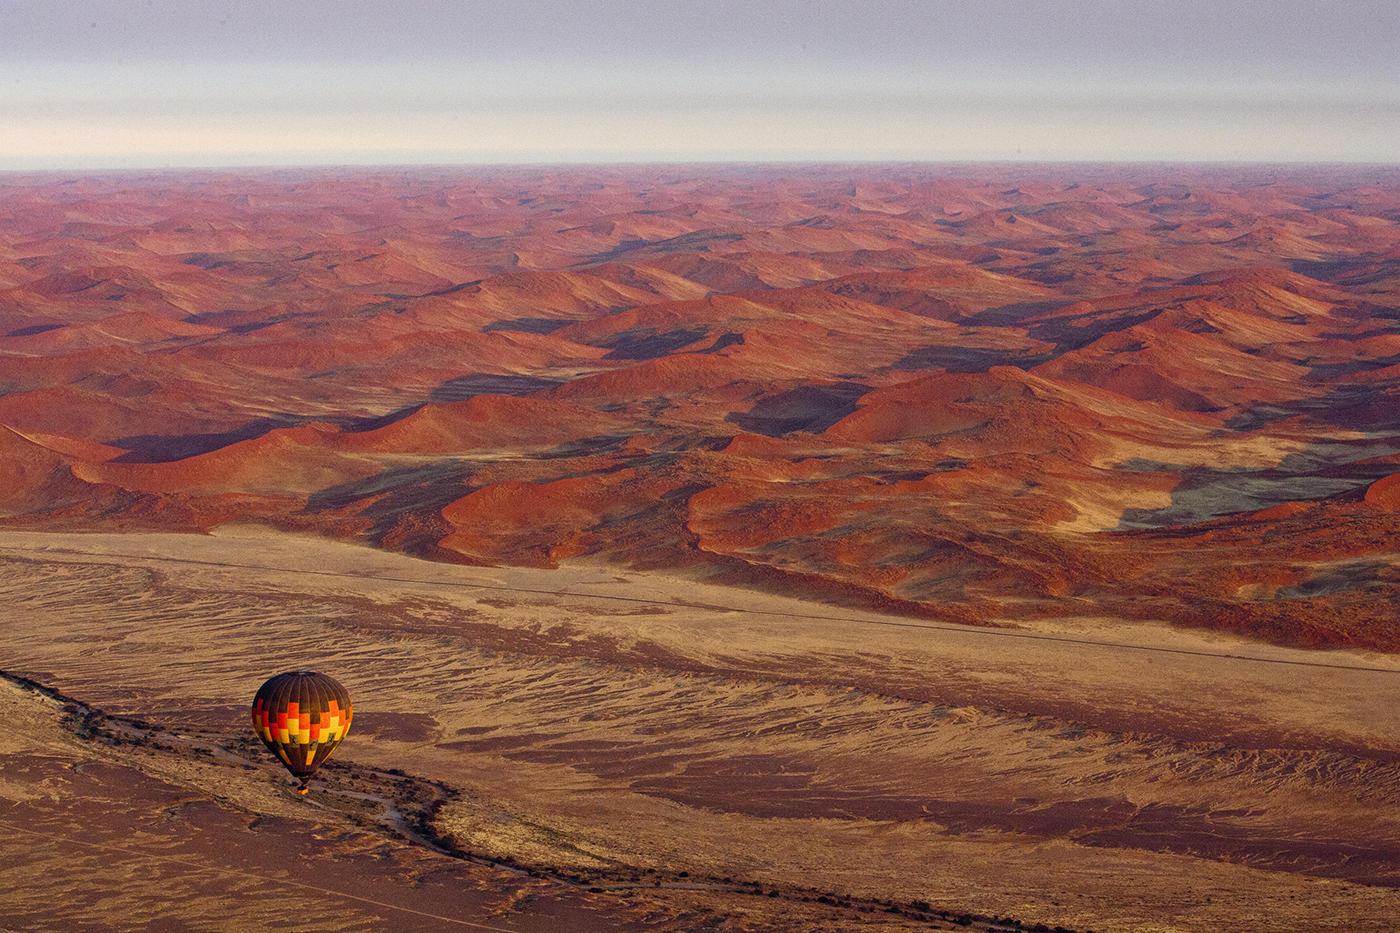 Balloon_safaris